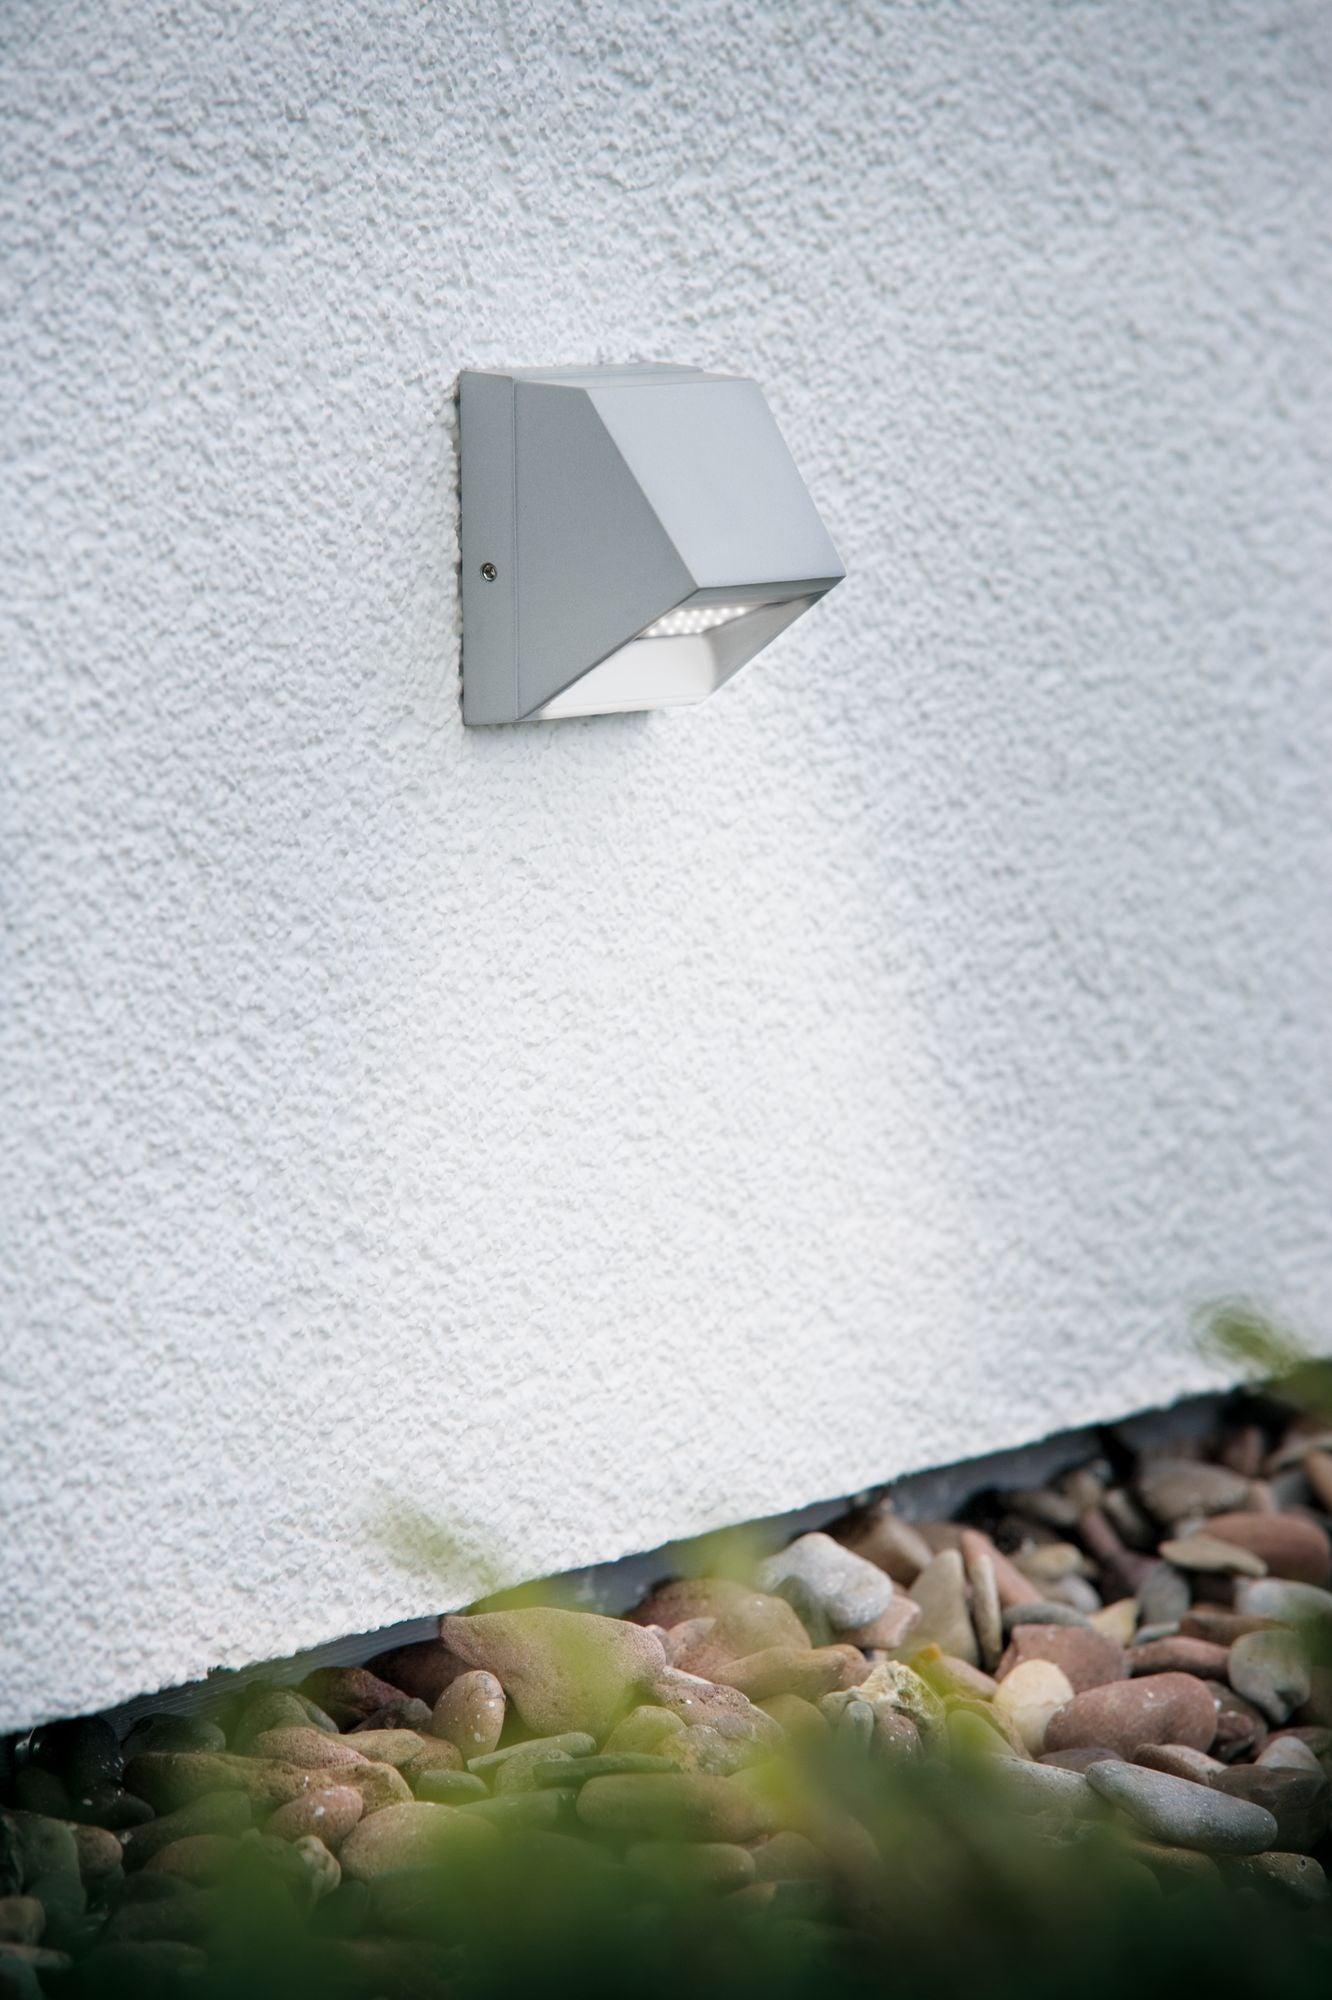 Spot Exterieur Led Integree 29 Lm Gris Saillie Ip44 Mural Paulmann Leroy Merlin